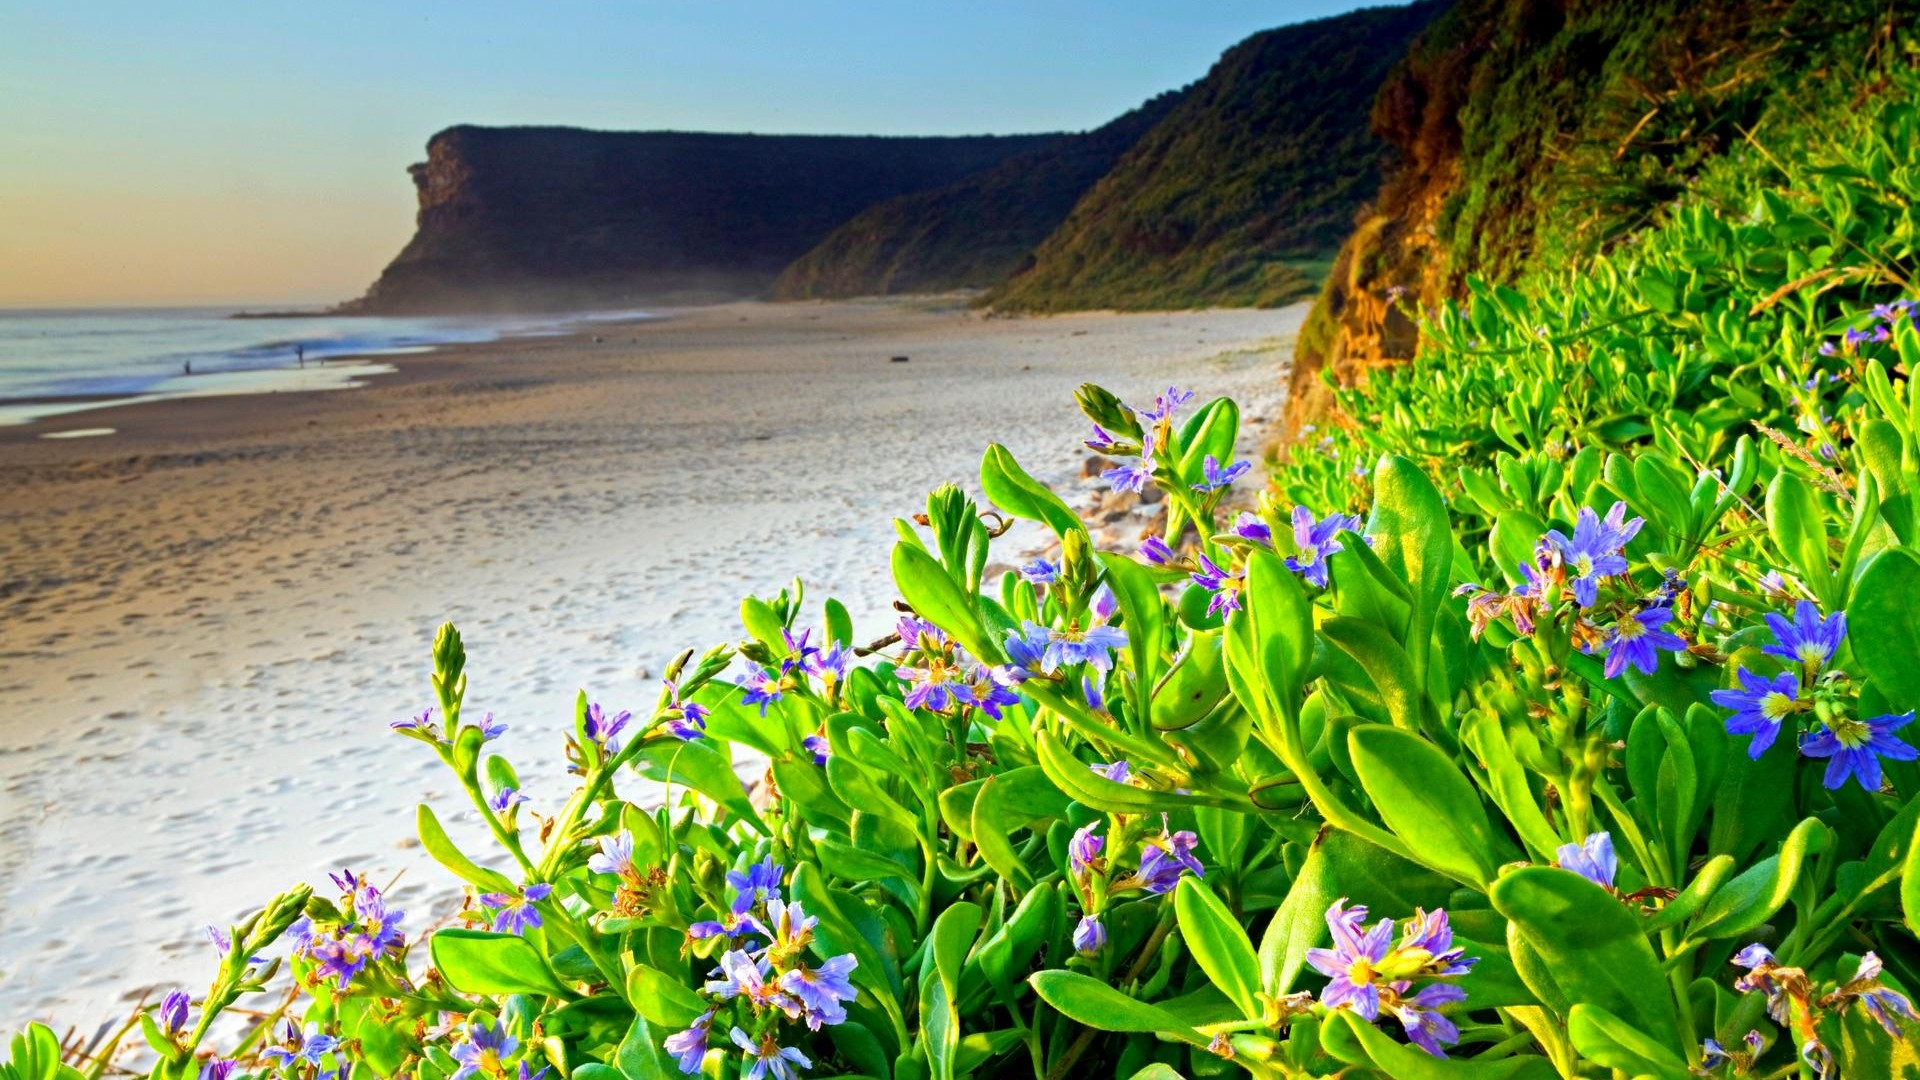 Coast Beach Spring Flowers Hd Wallpaper Wallpapers13com 1920x1080